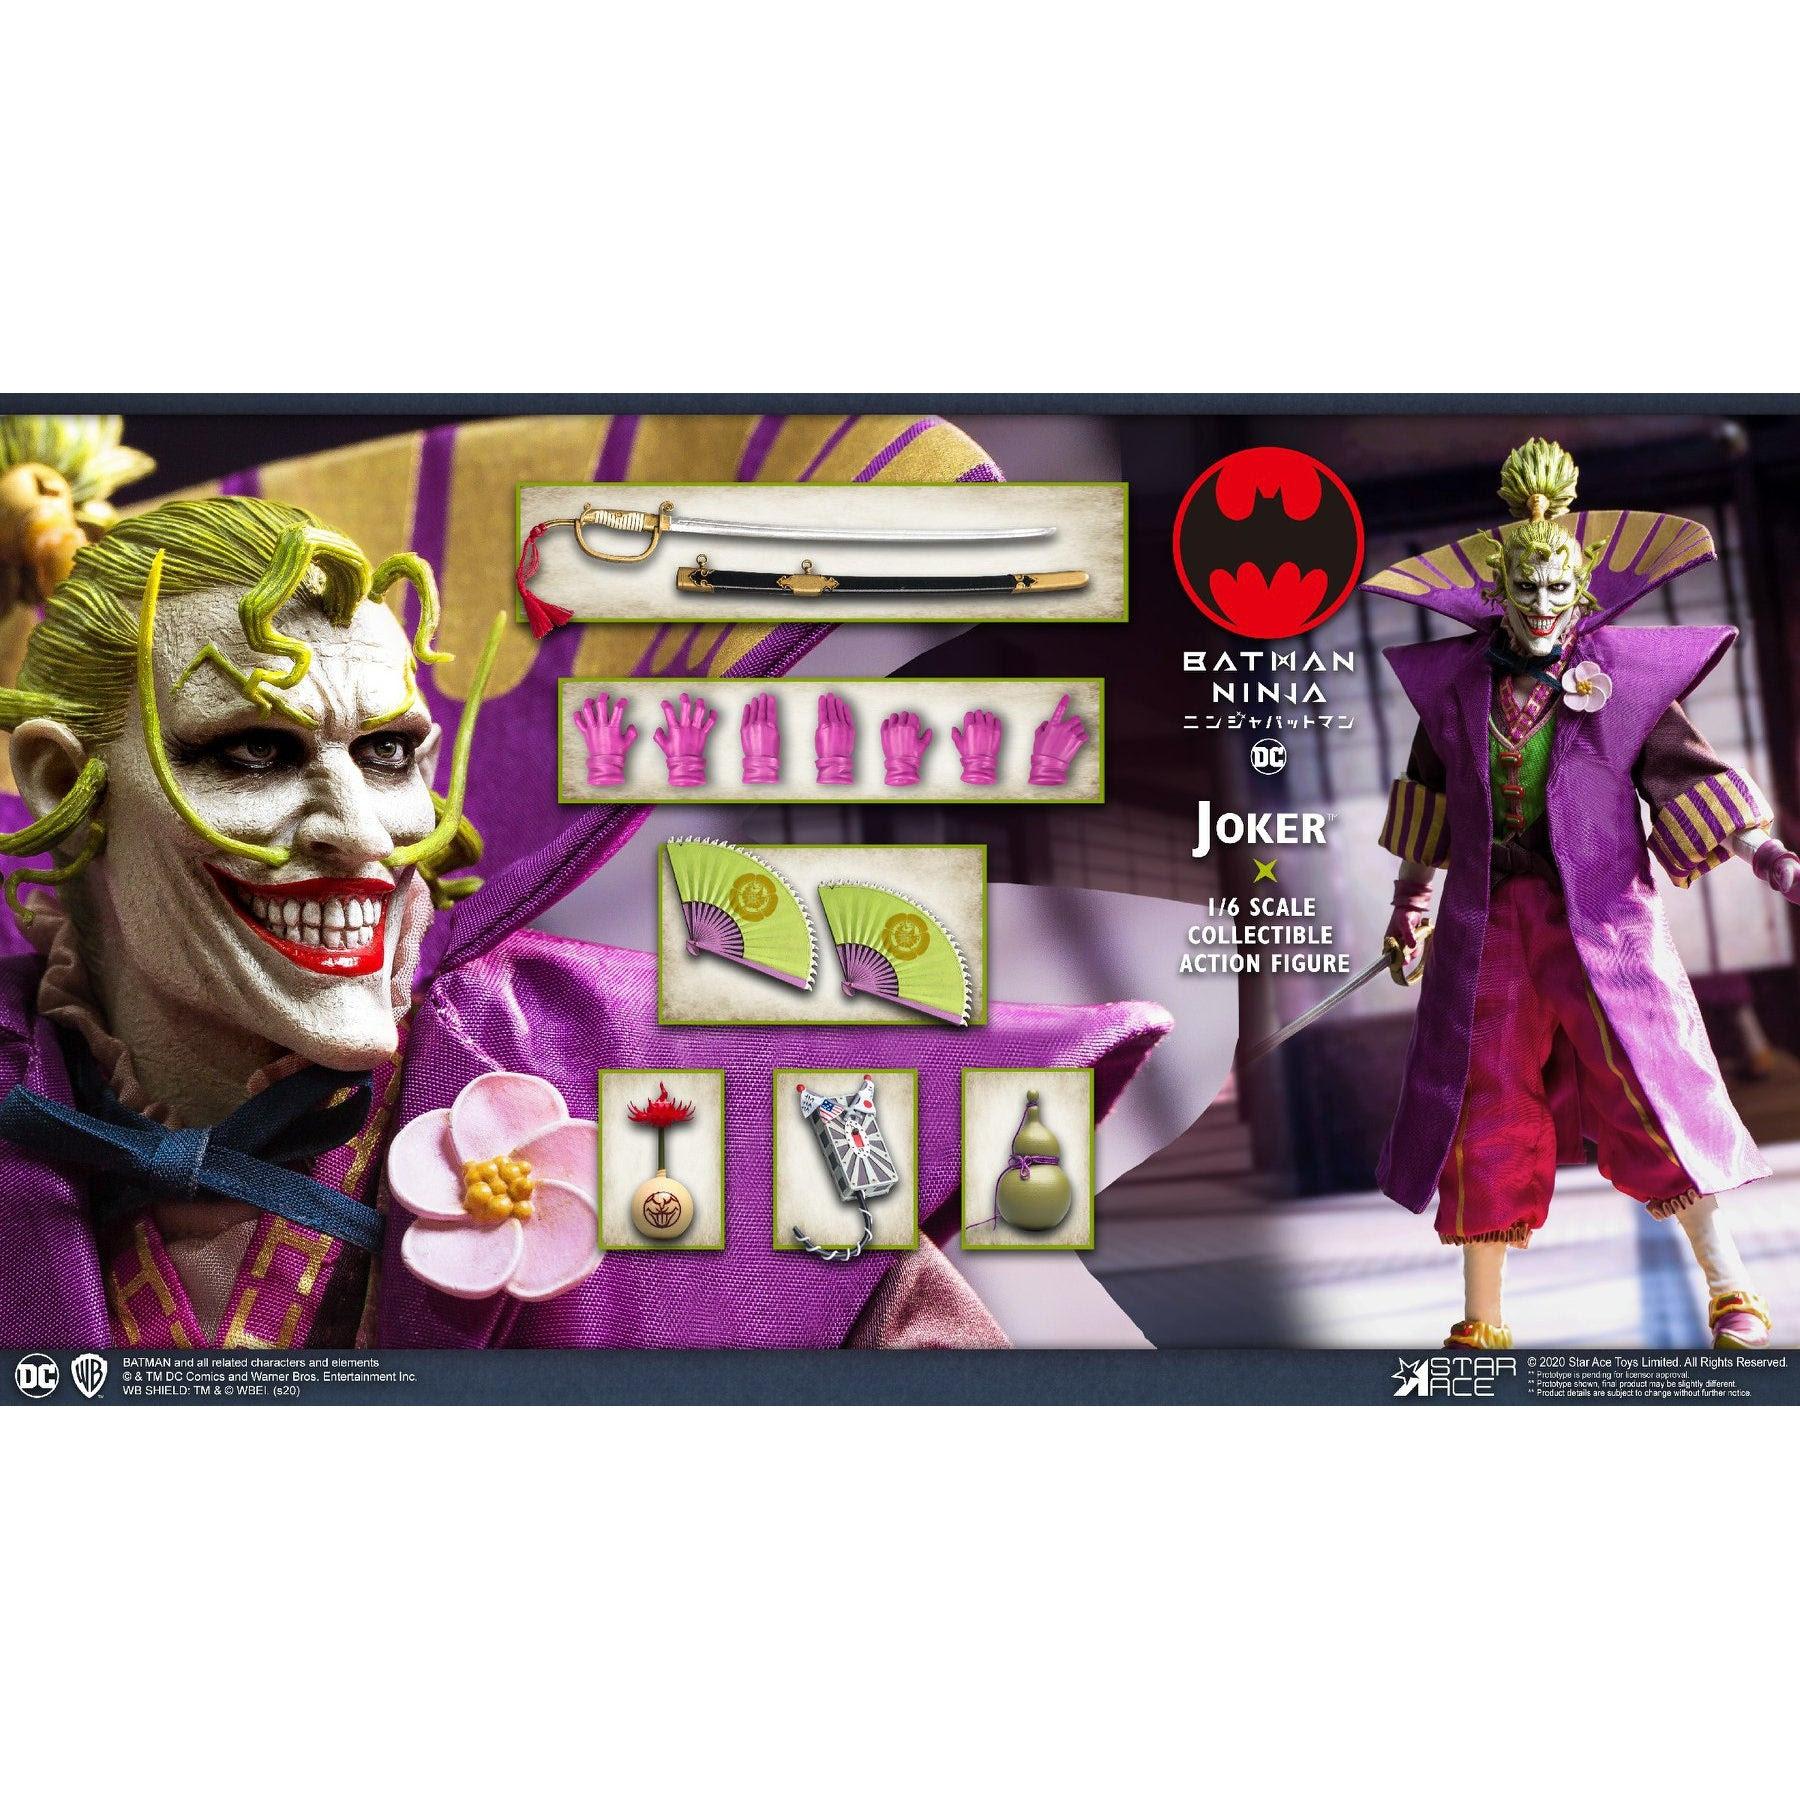 Image of Batman Ninja Joker 1:6 Scale Action Figure - MARCH 2021